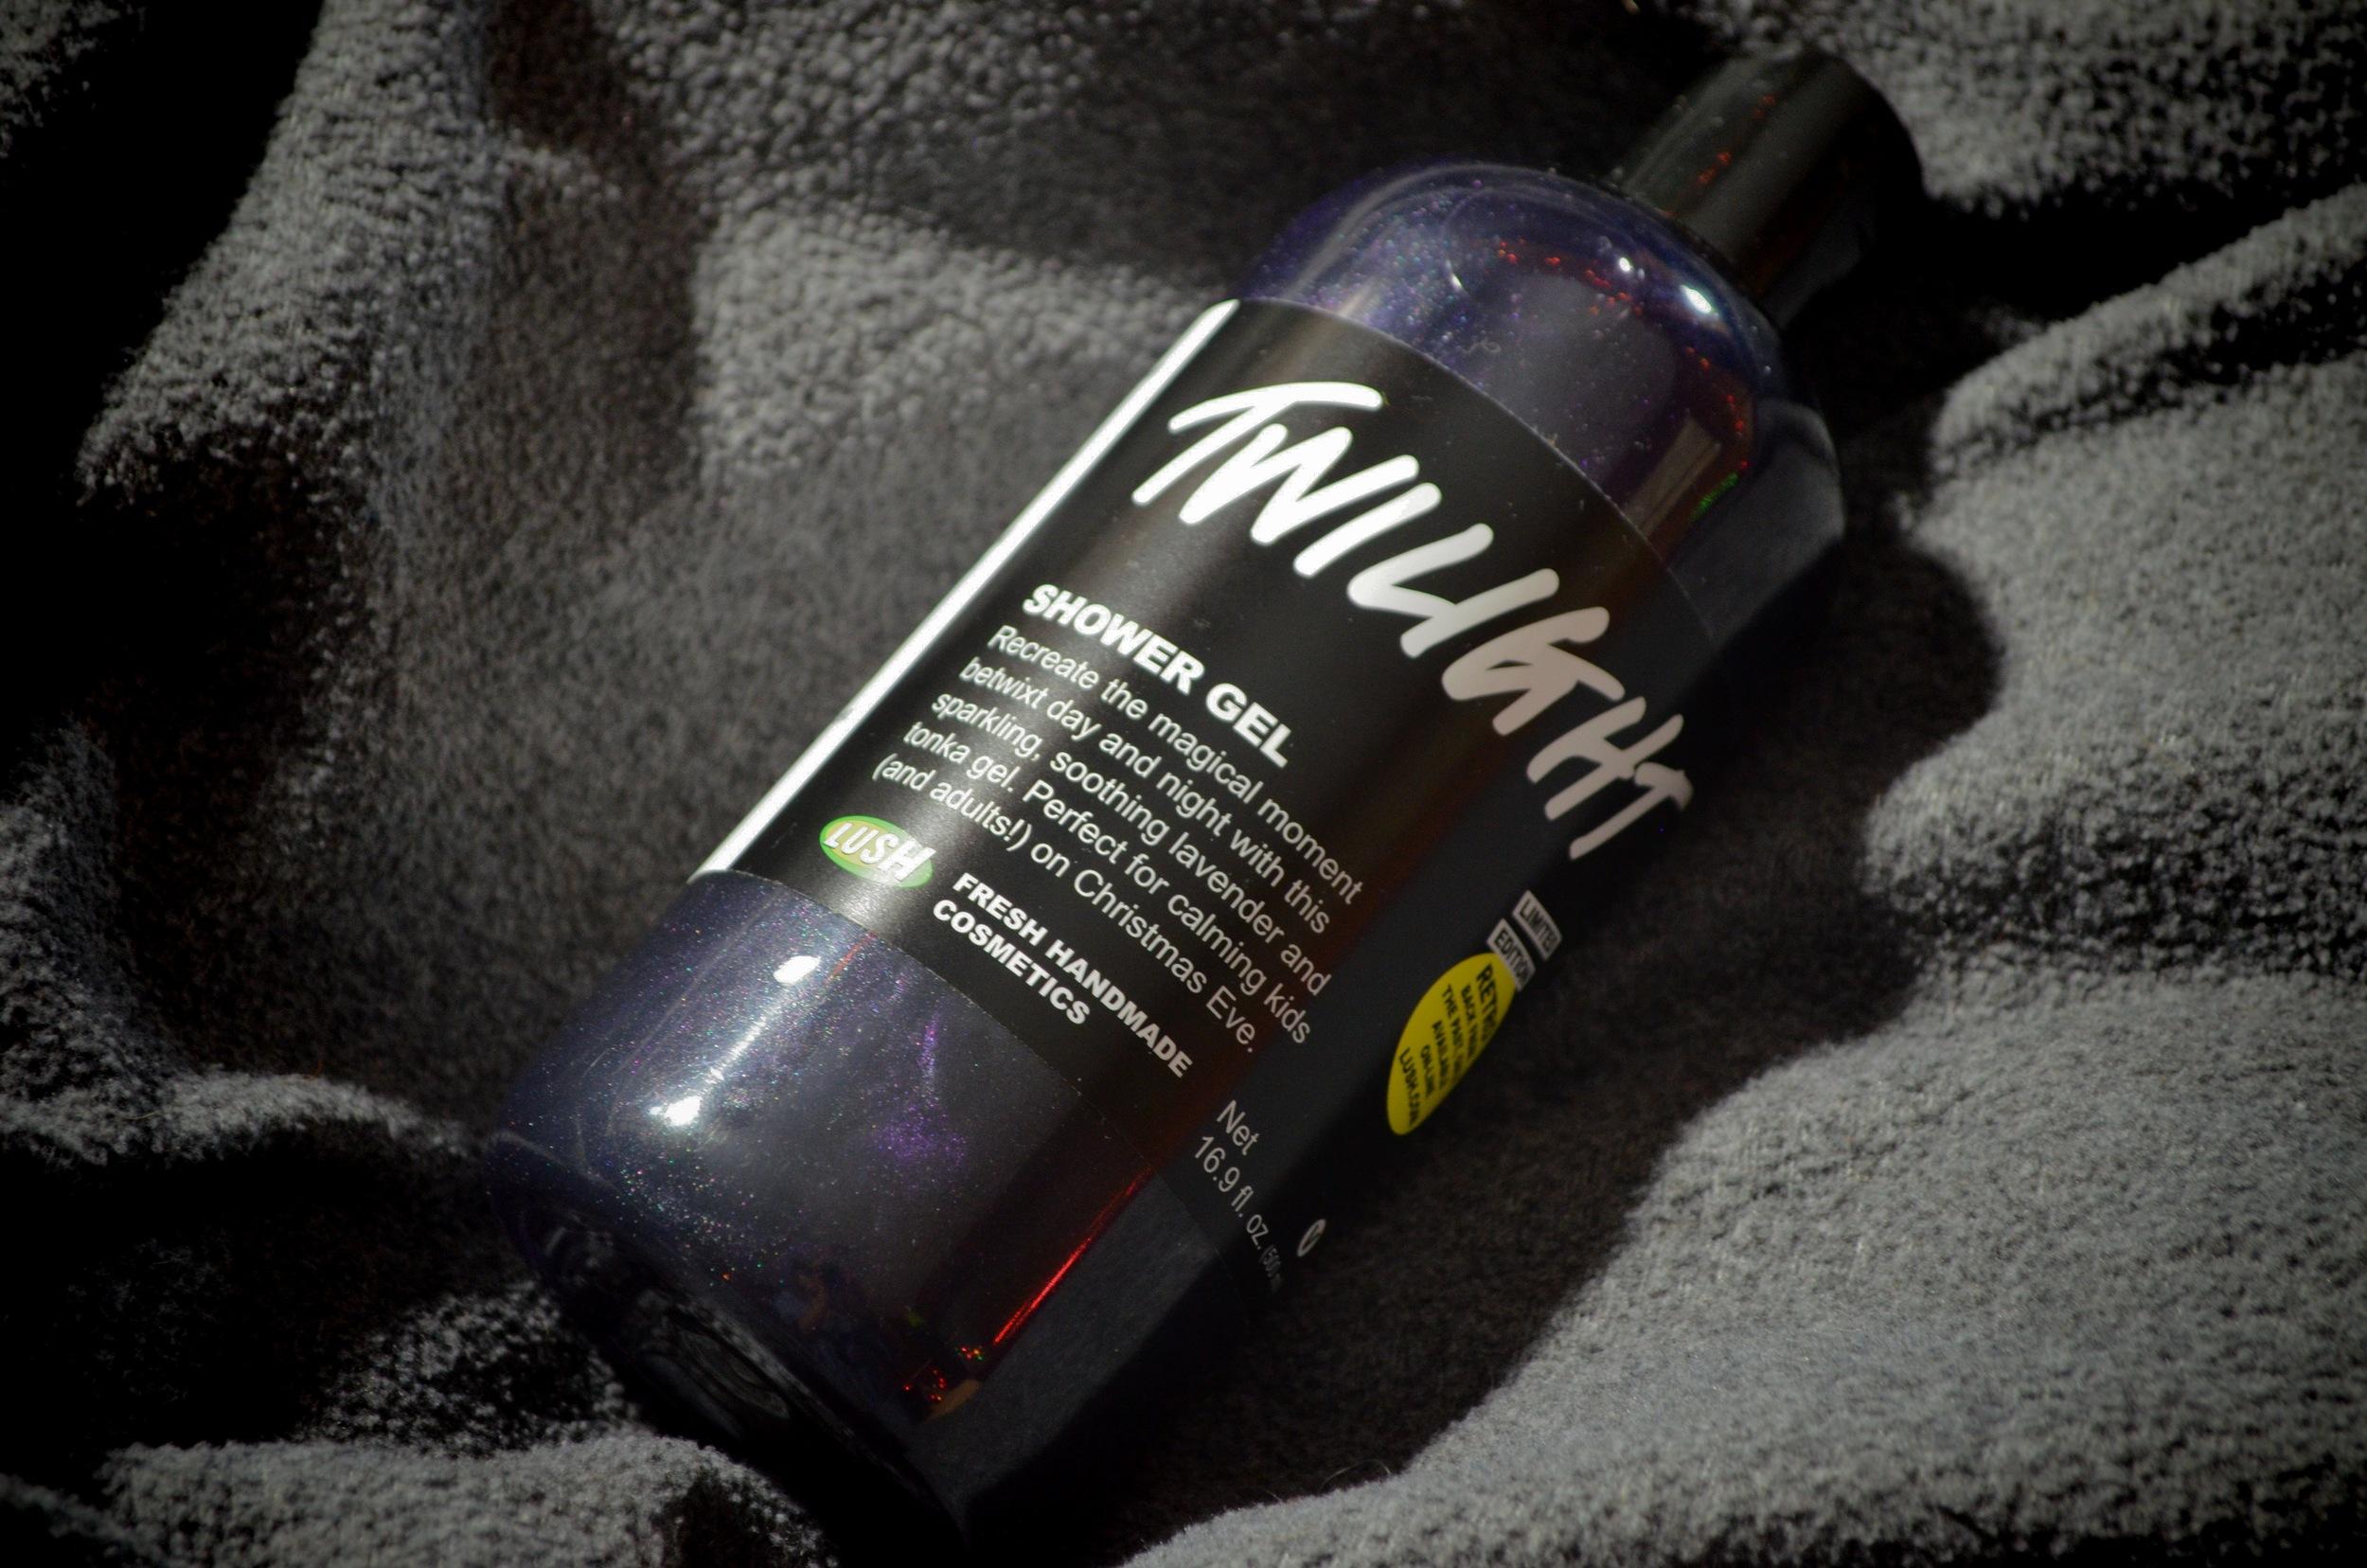 lush twilight shower gel review